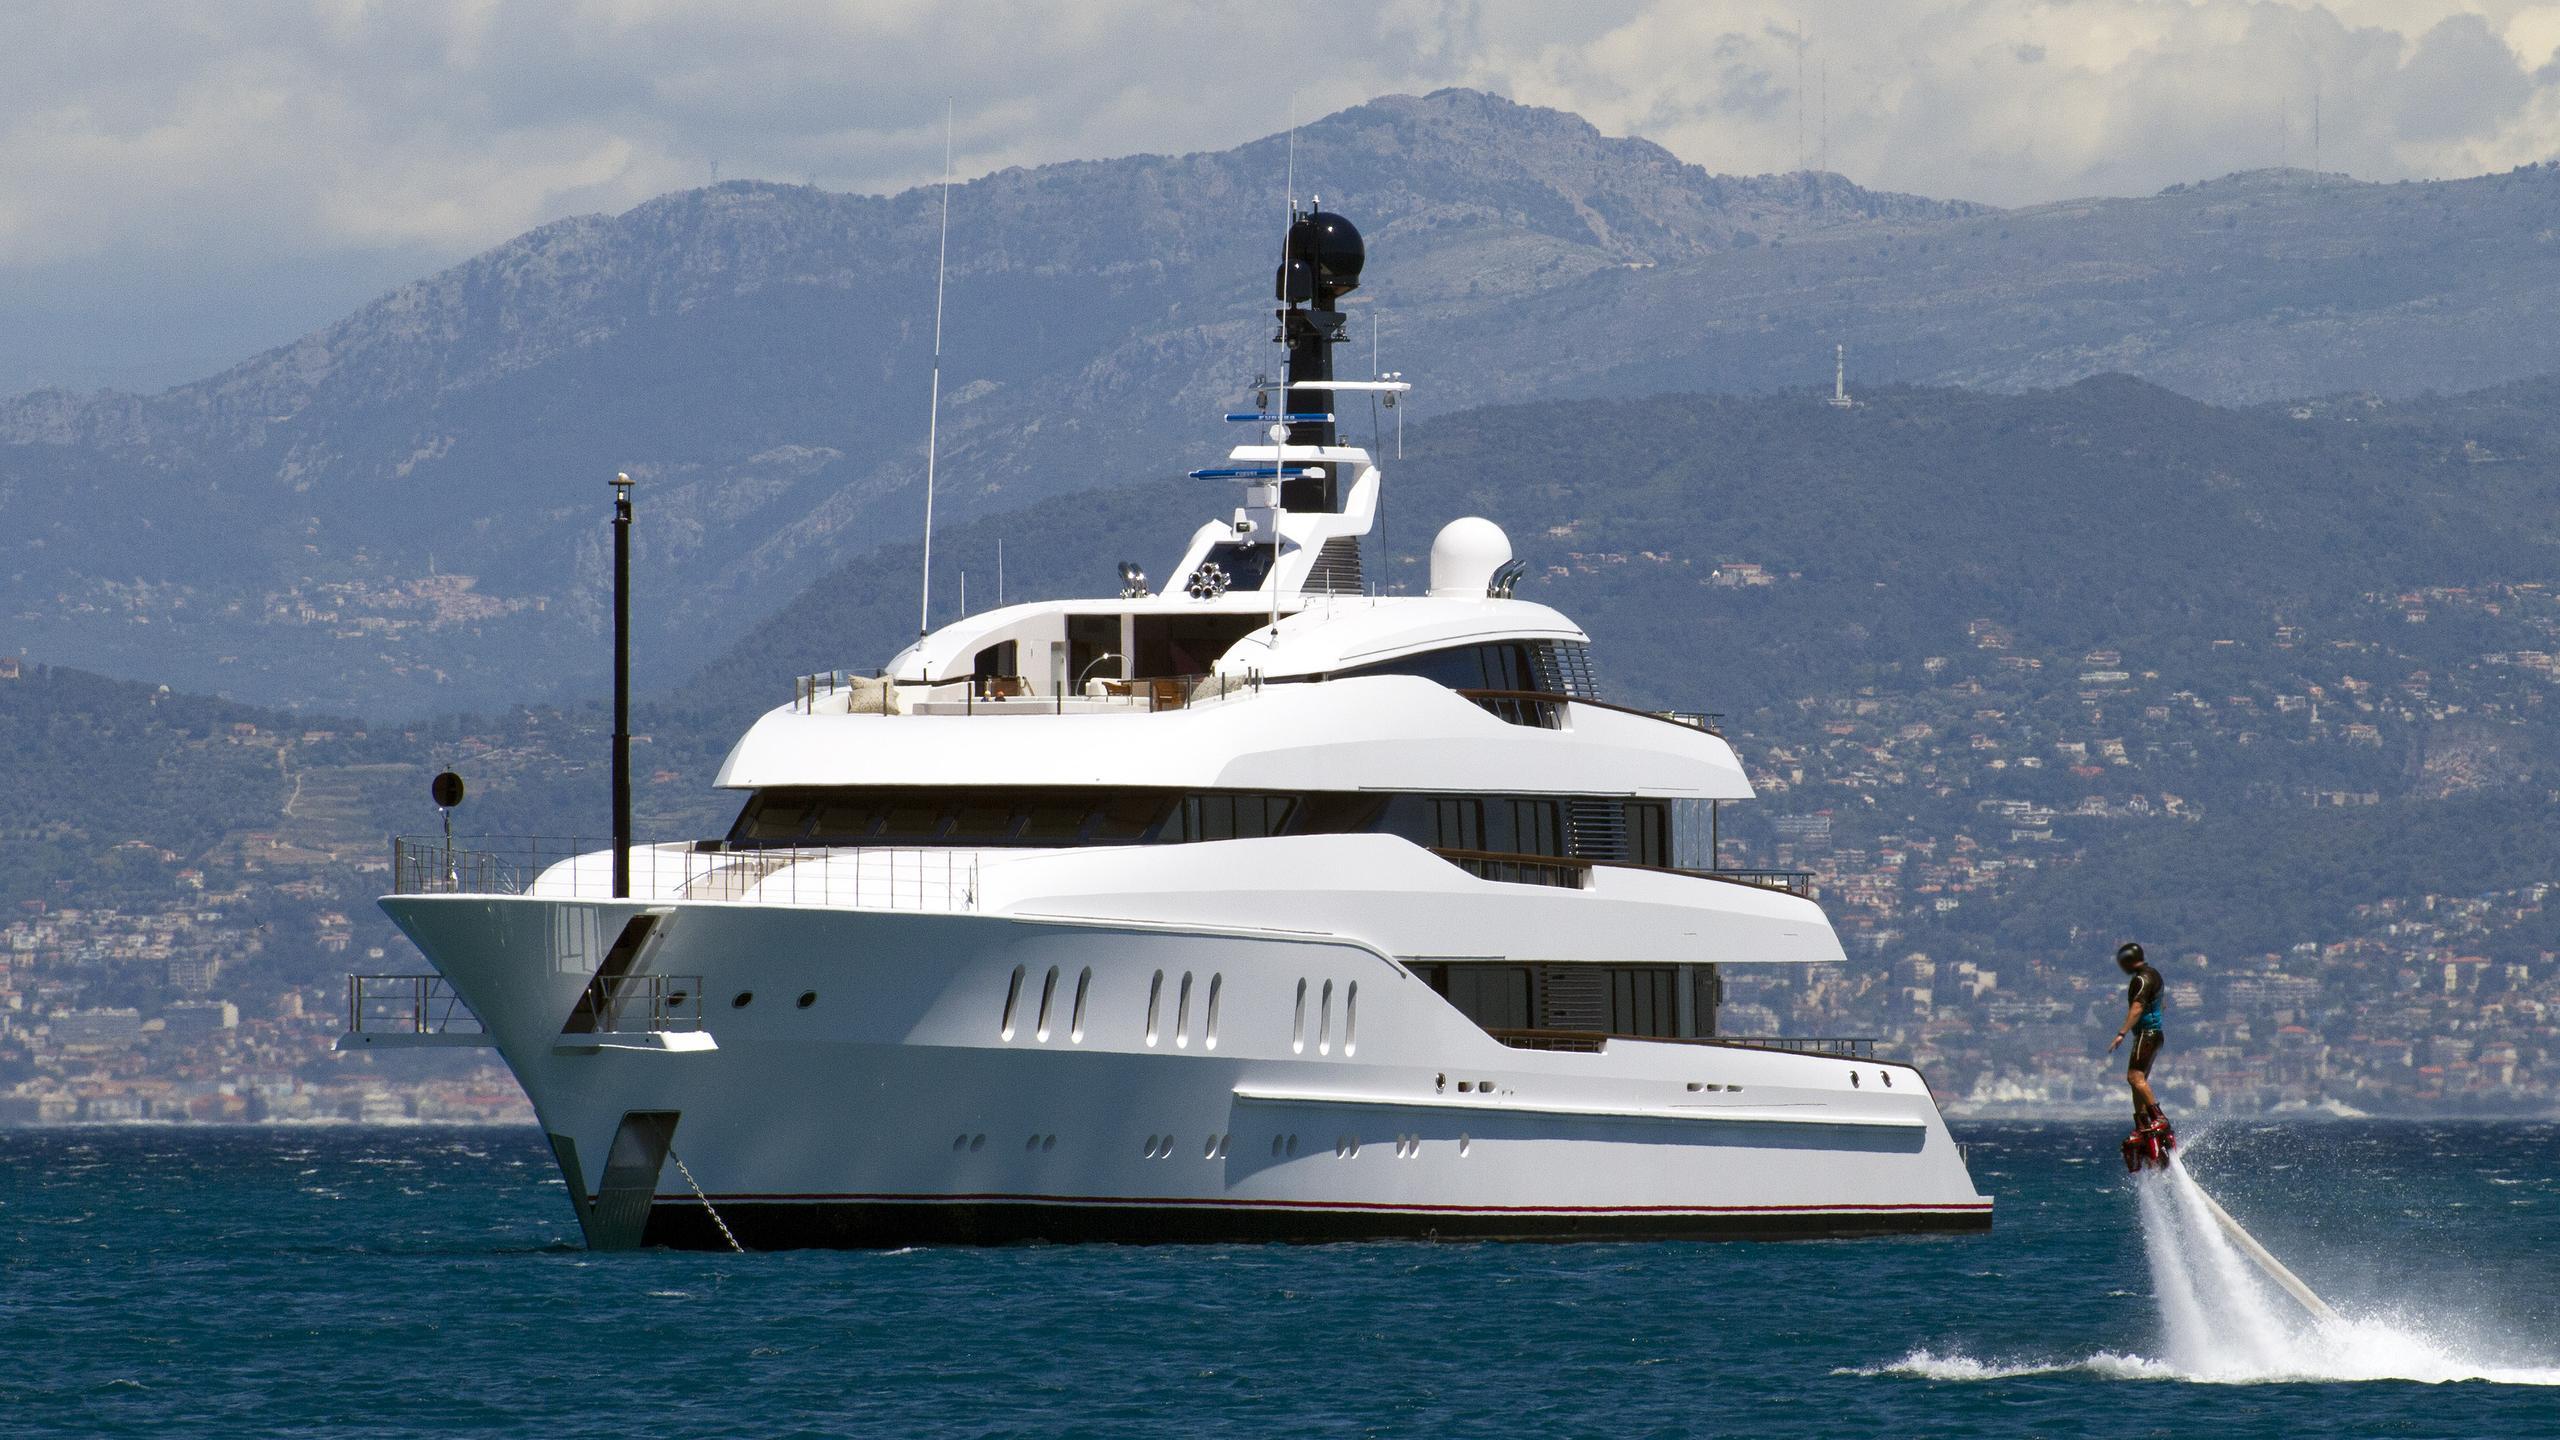 vanish-motor-yacht-feadship-2016-66m-half-profile